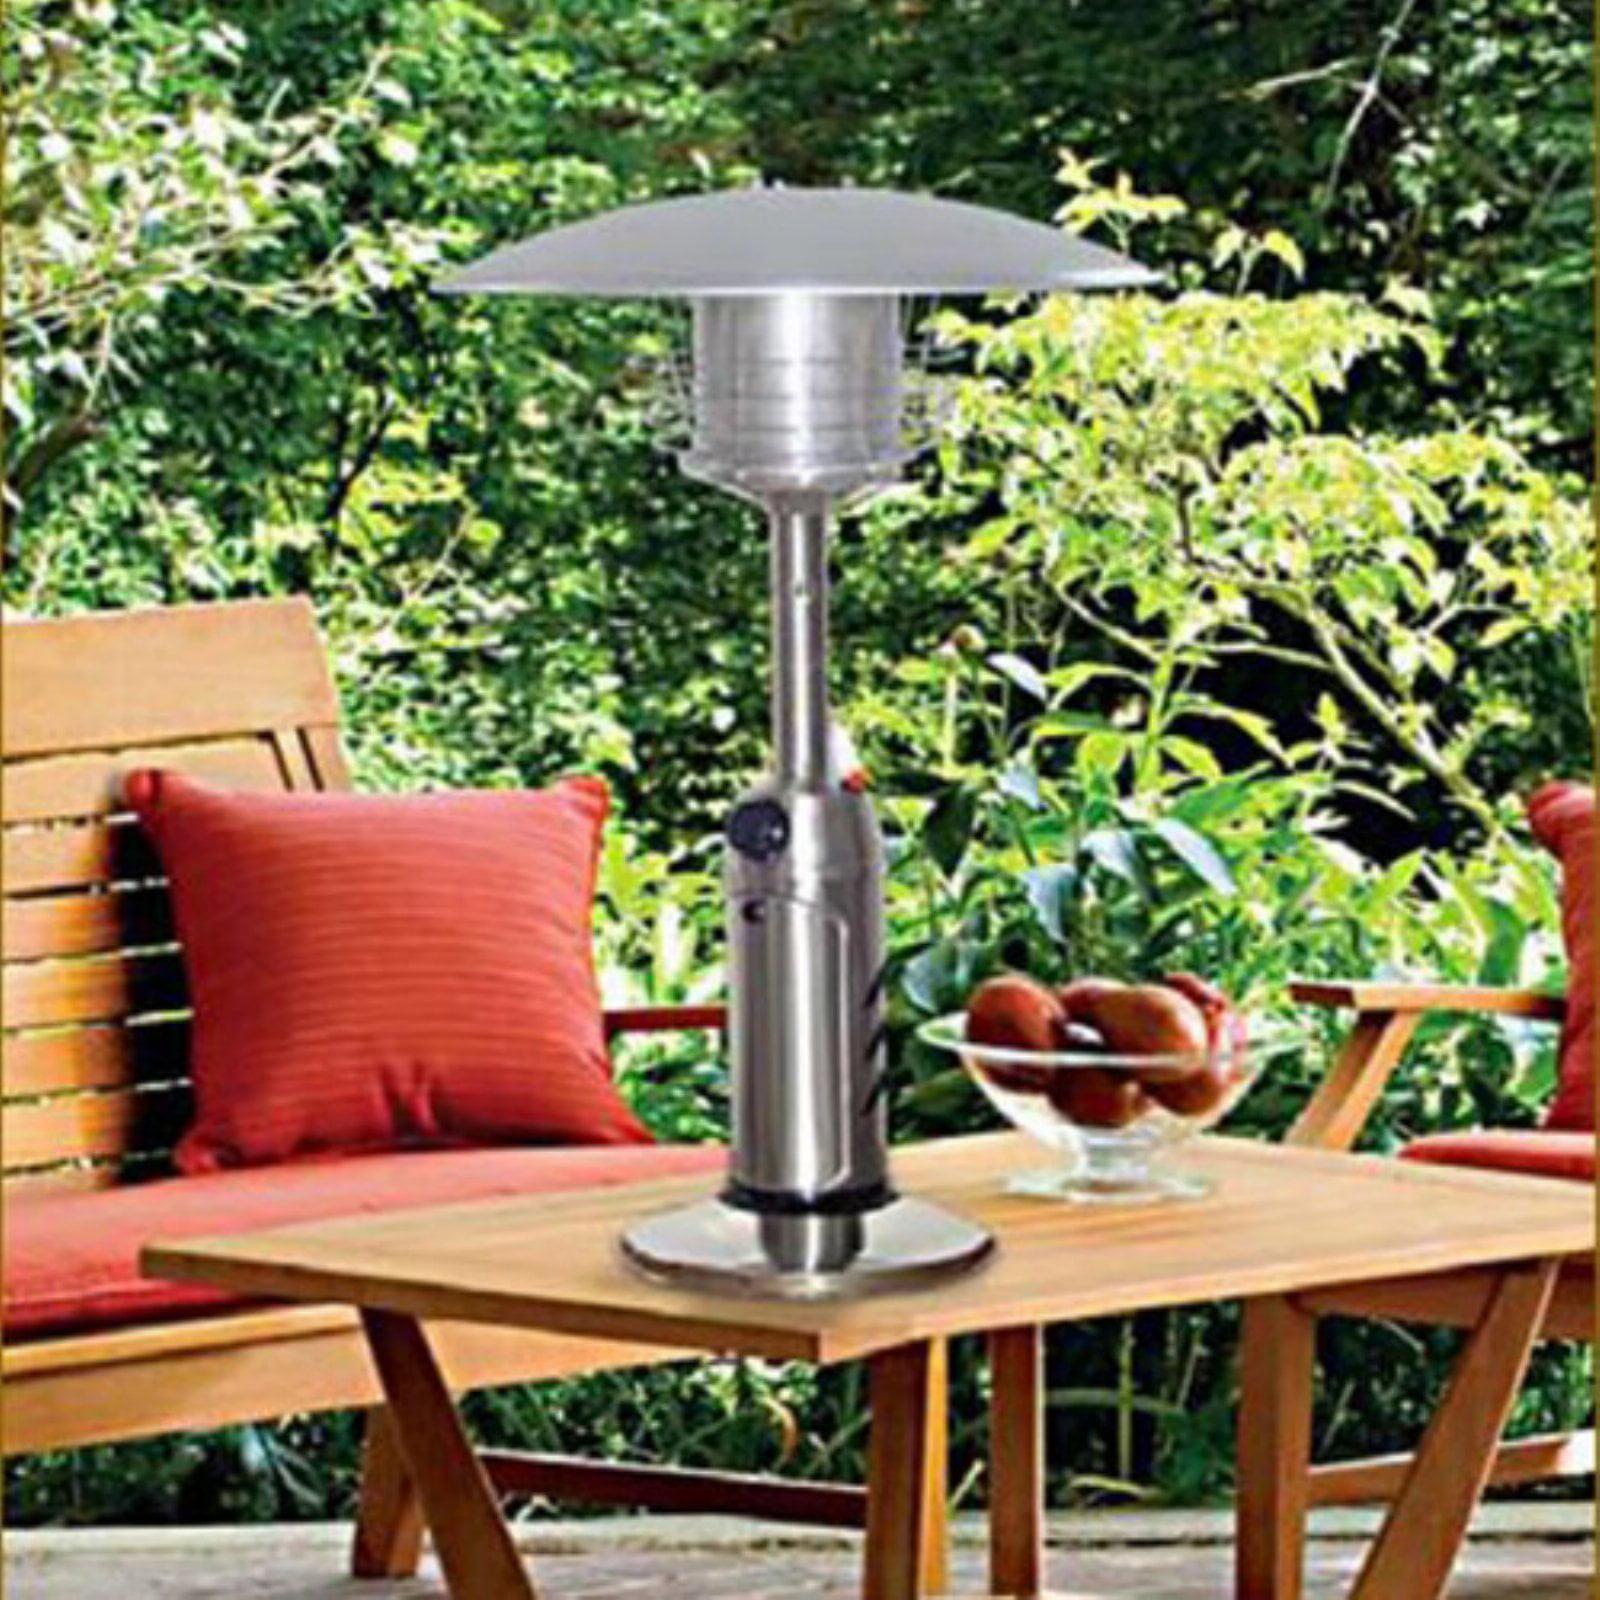 AZ Patio Heater Portable Stainless Steel Tabletop Heater